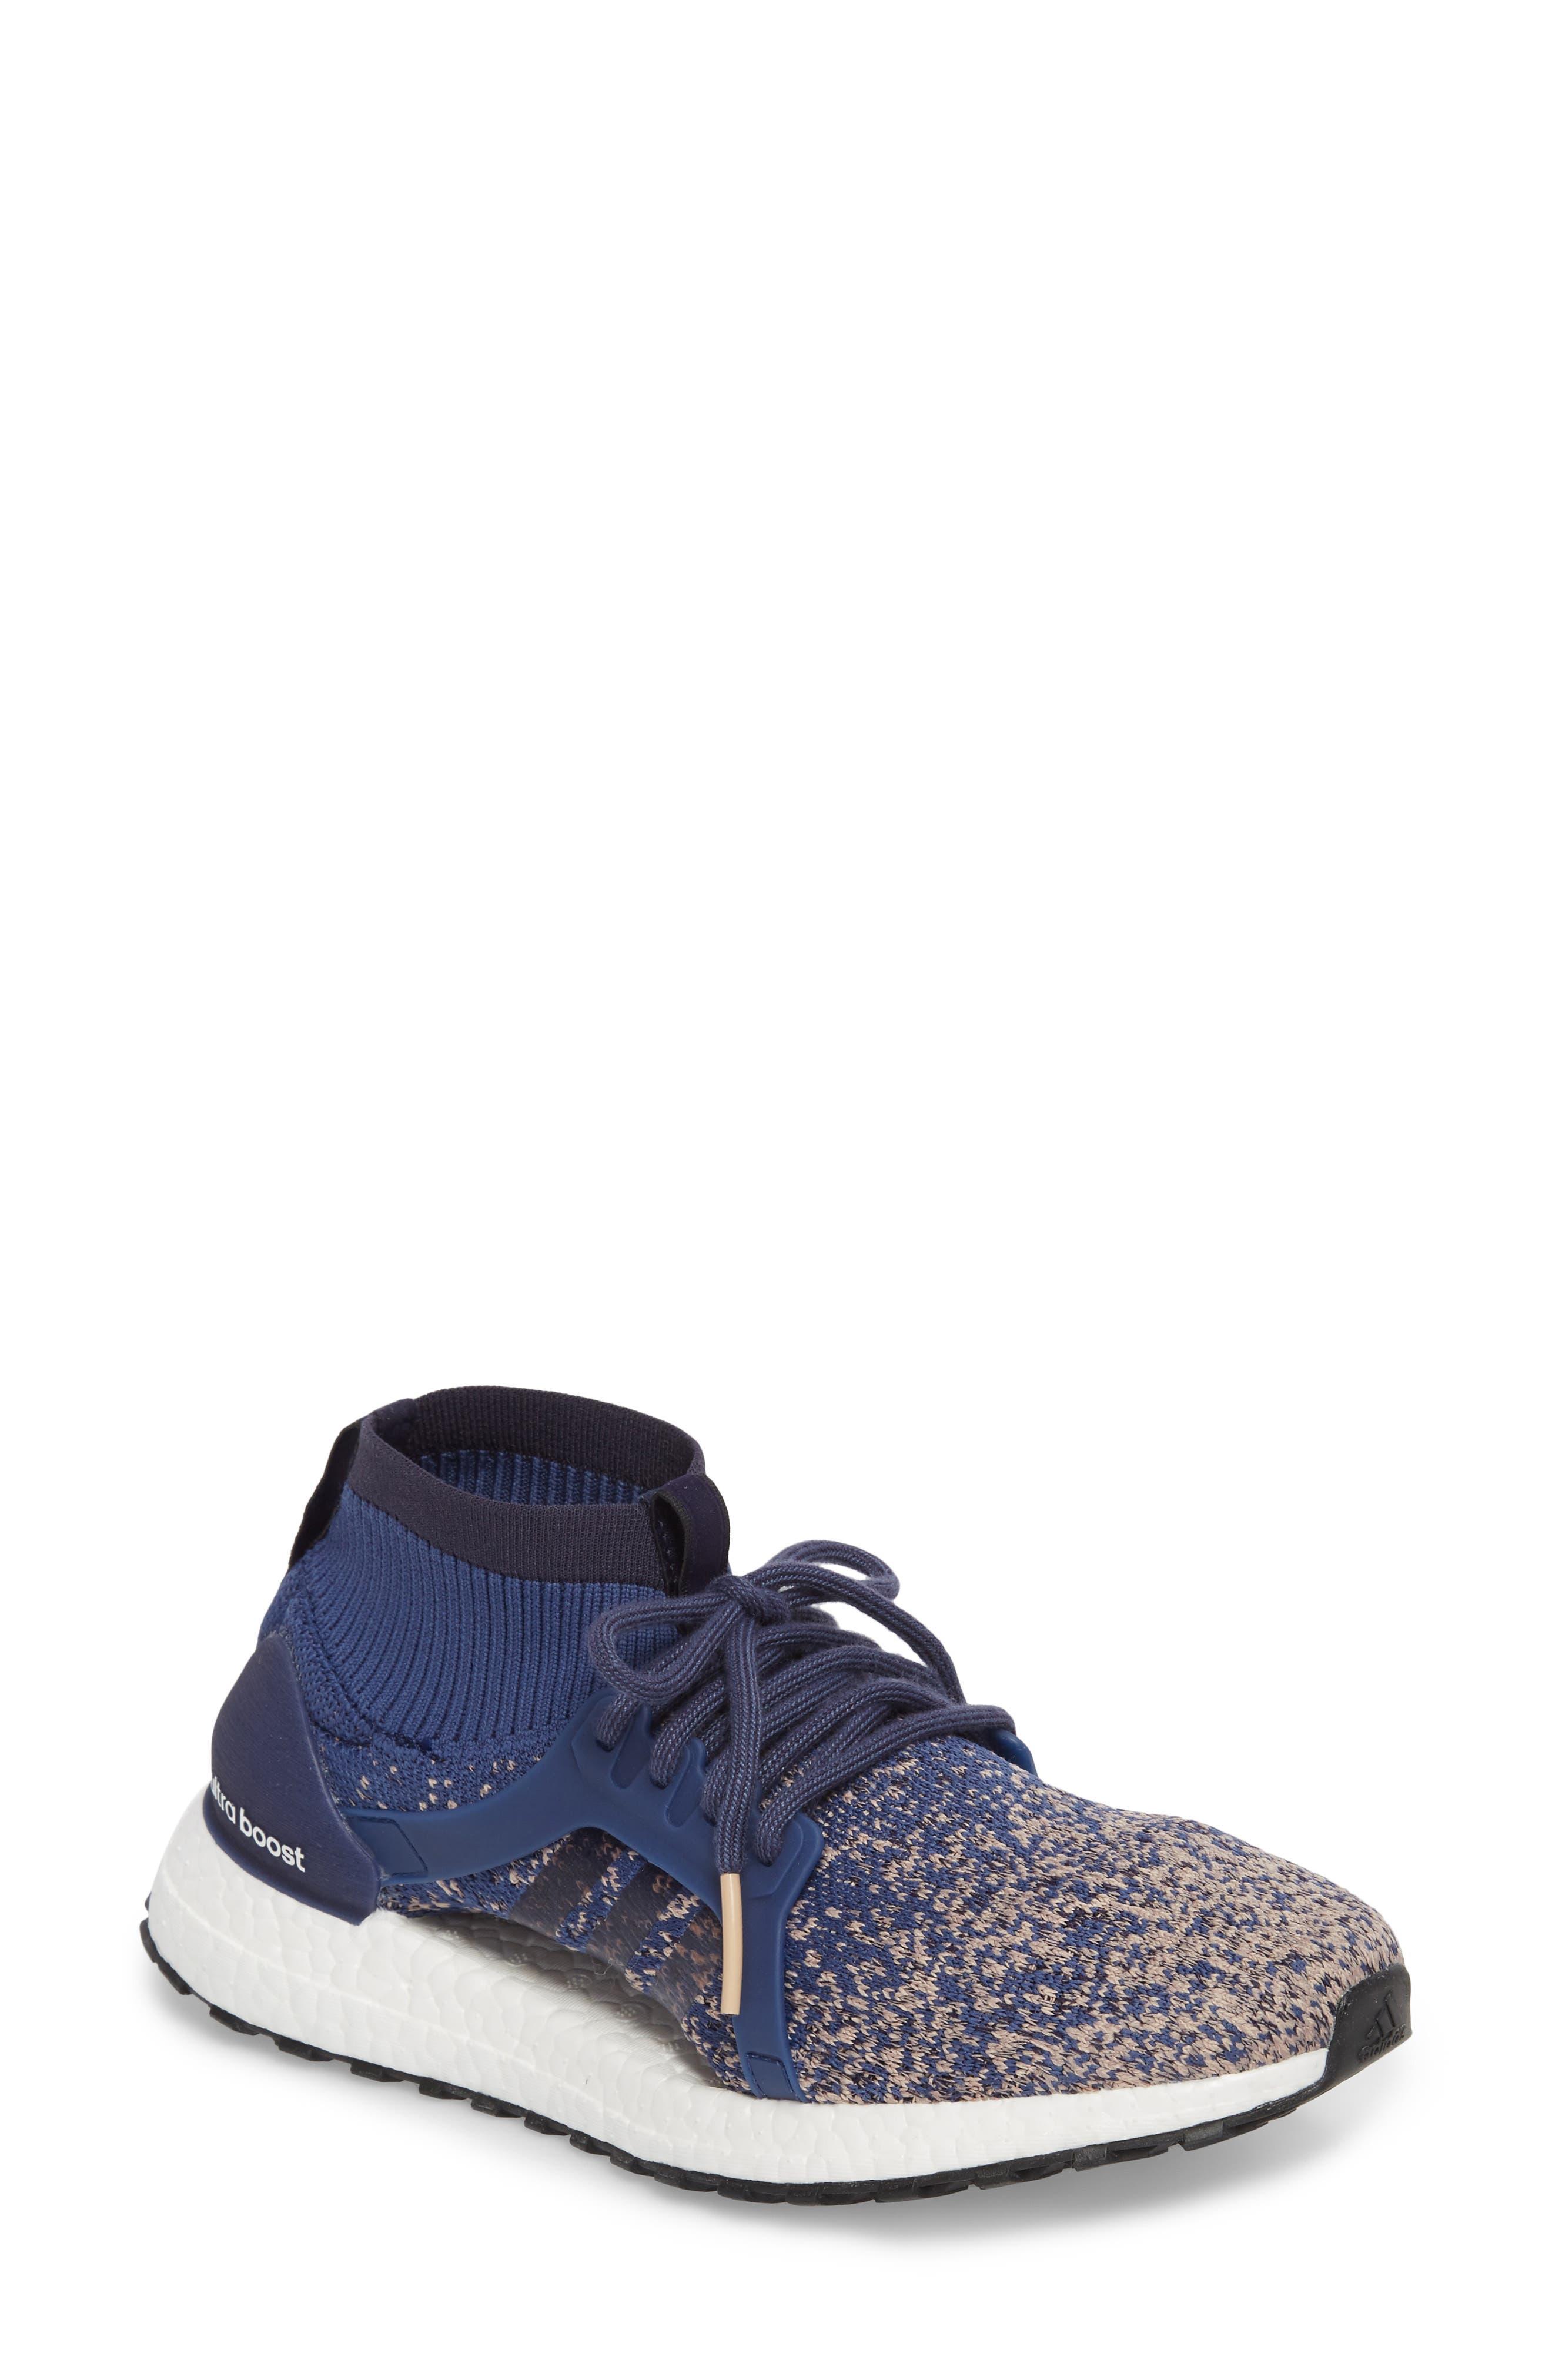 adidas UltraBOOST X All Terrain Water Resistant Running Shoe (Women)